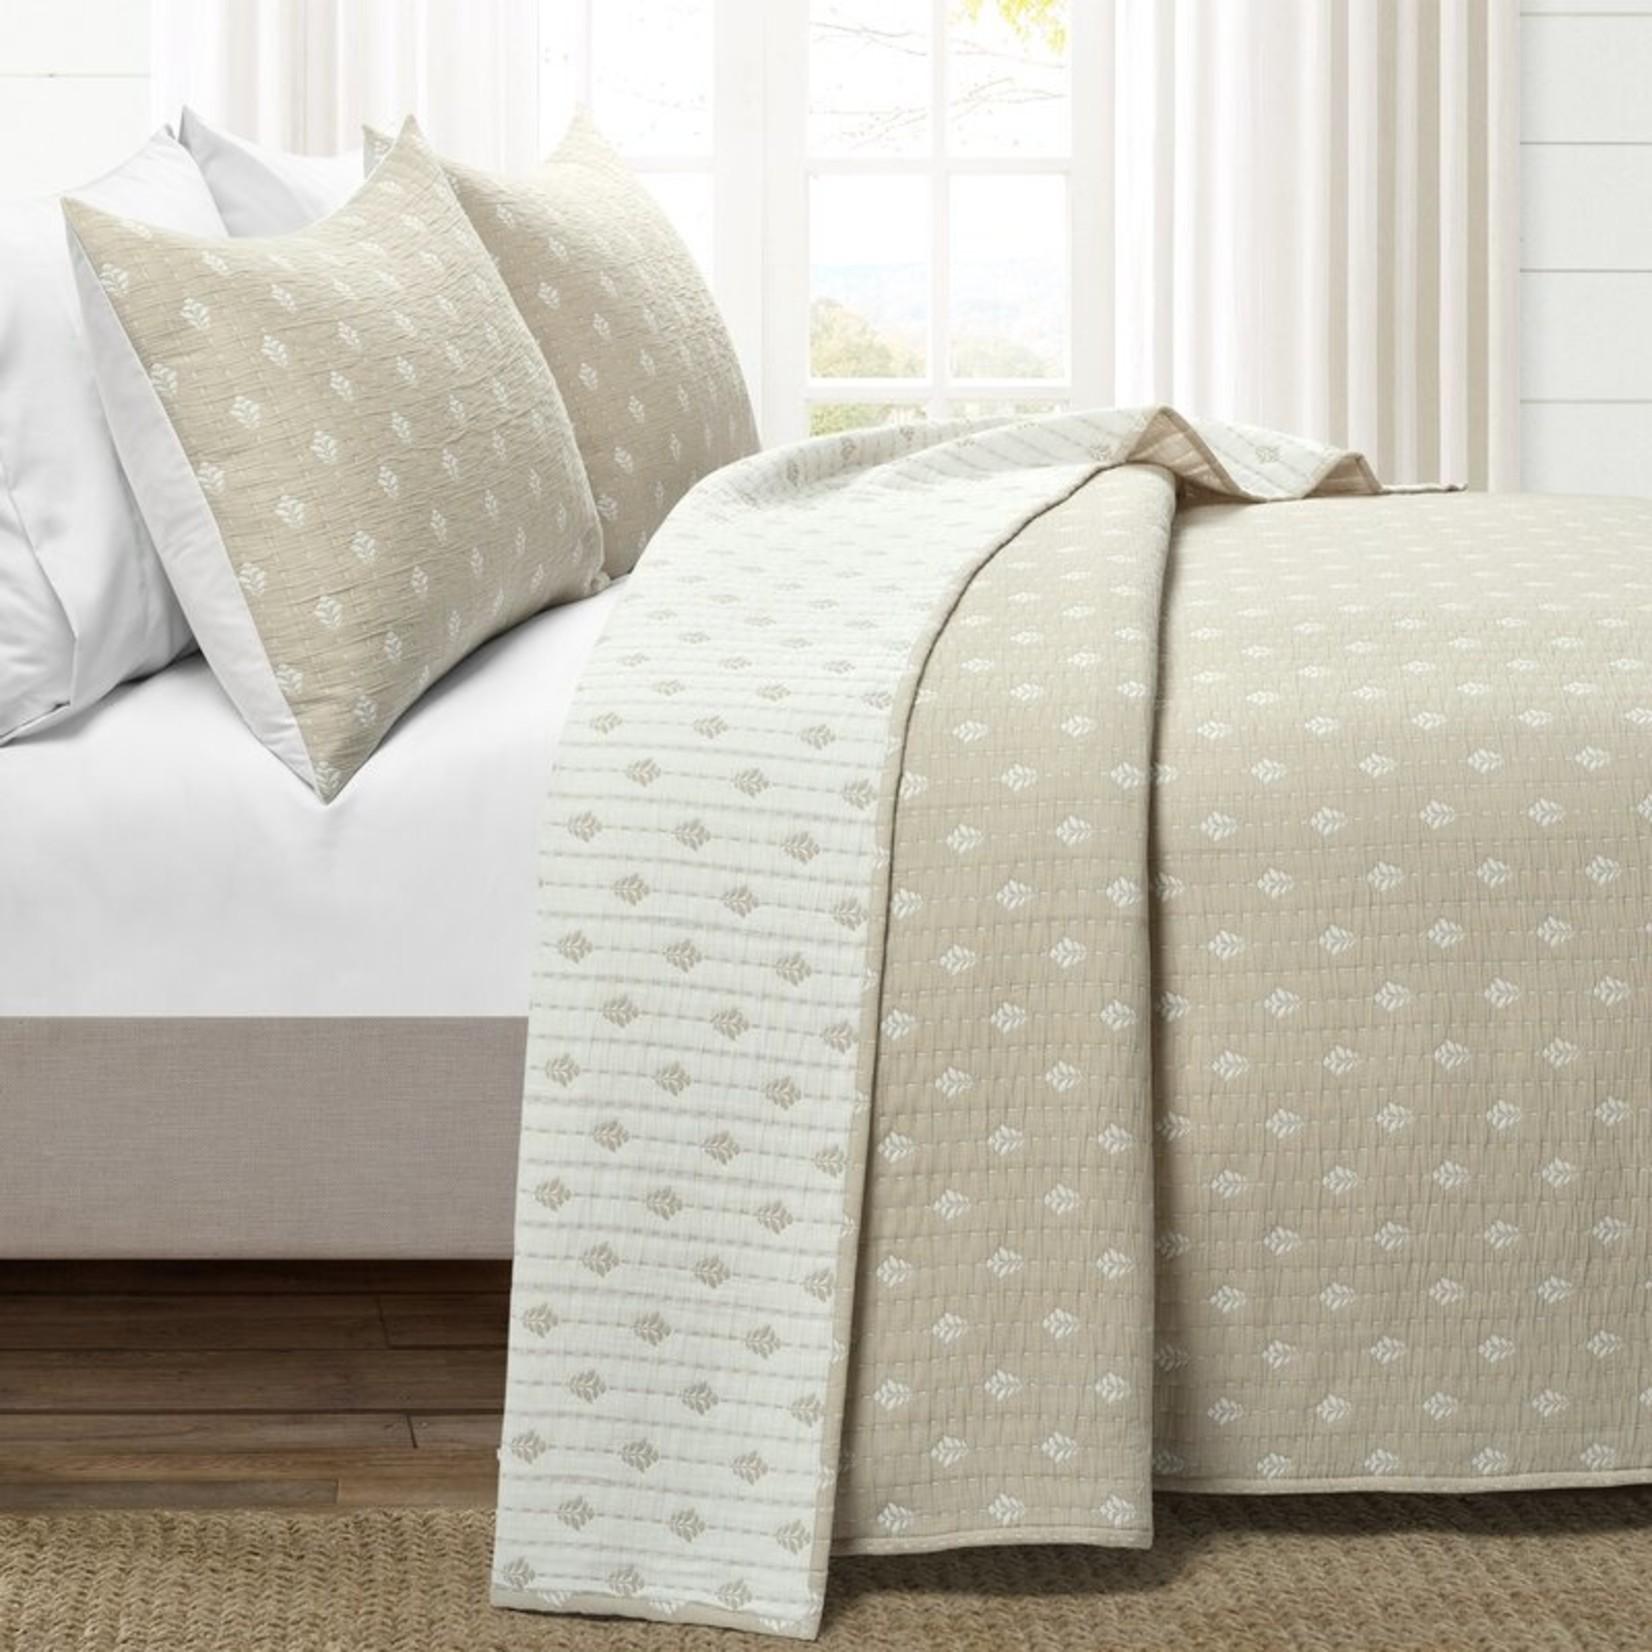 *King - Griswalda Reversible Quilt Set - Neutral/Off-White - Final Sale